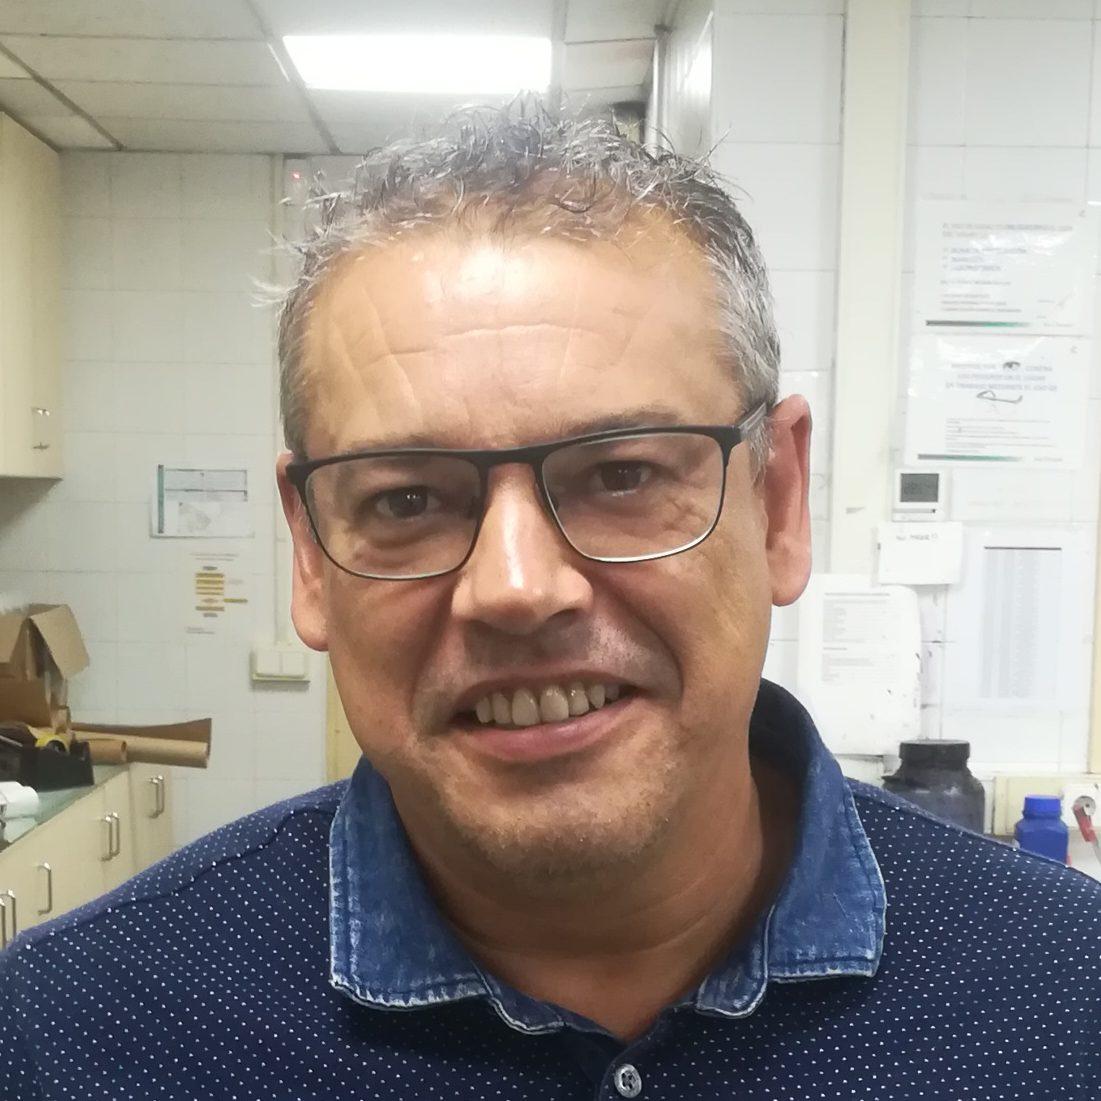 Jordi Platero